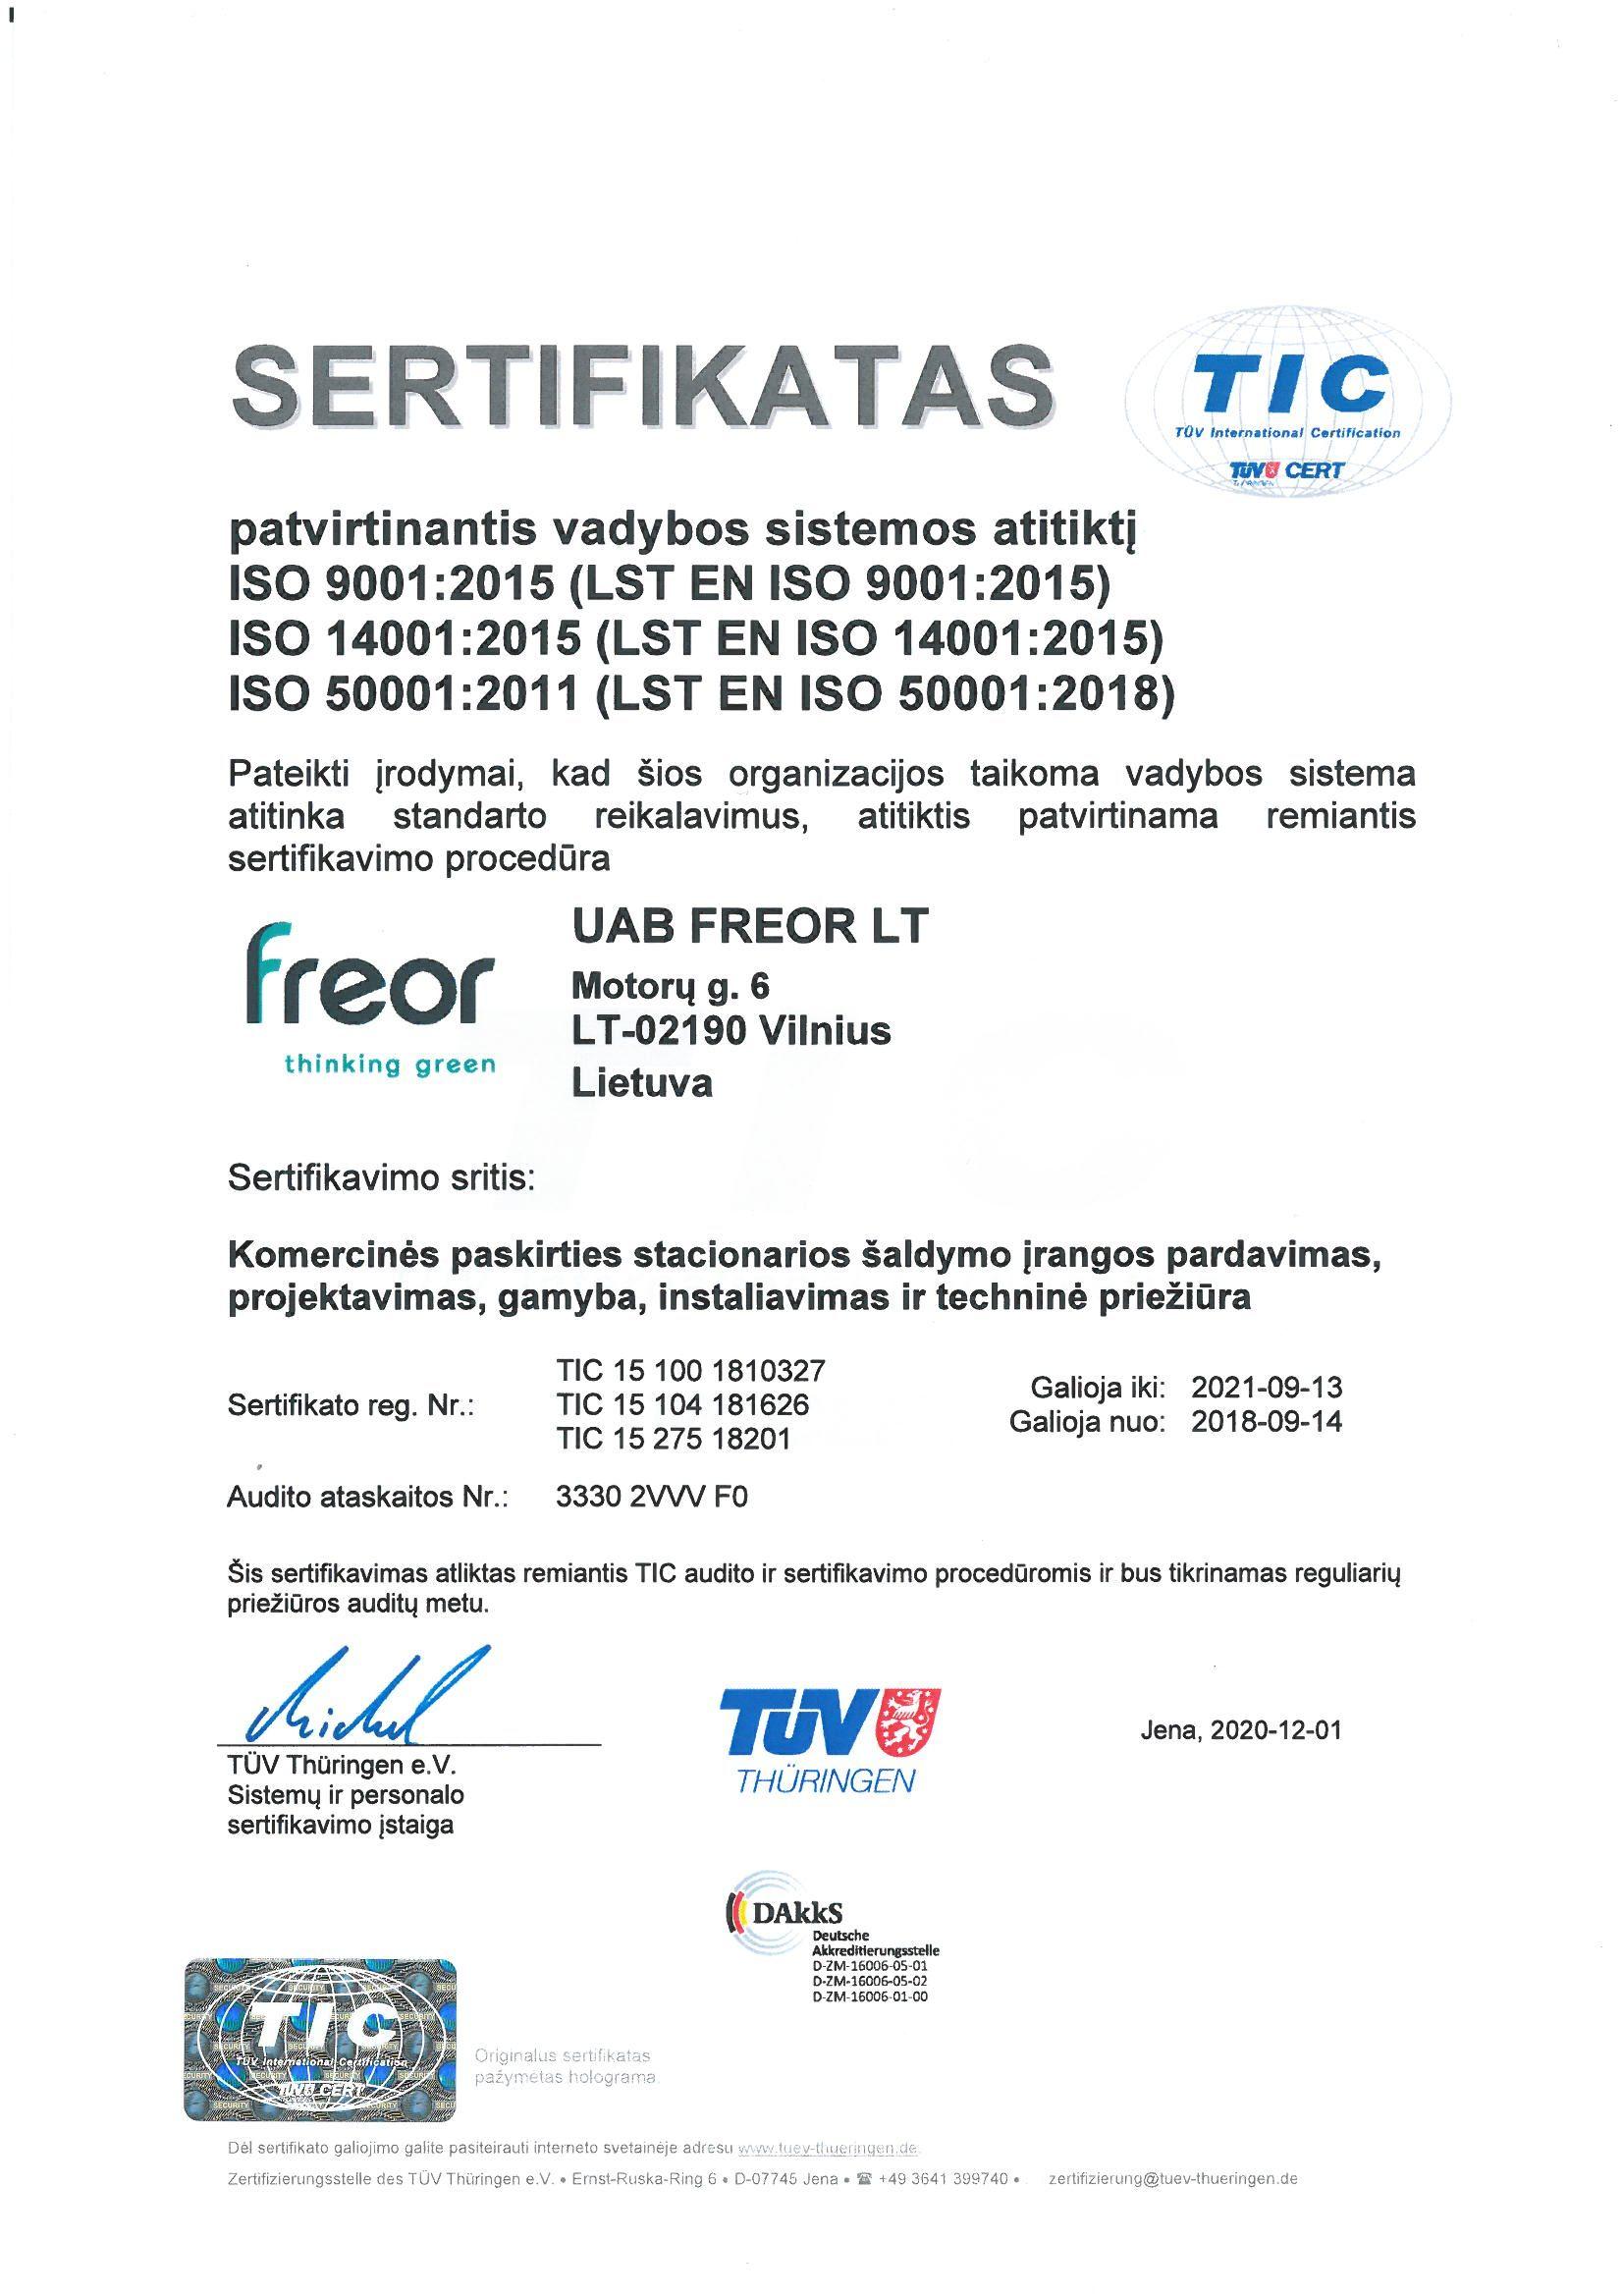 FREOR ISO sertifikatas_TUV